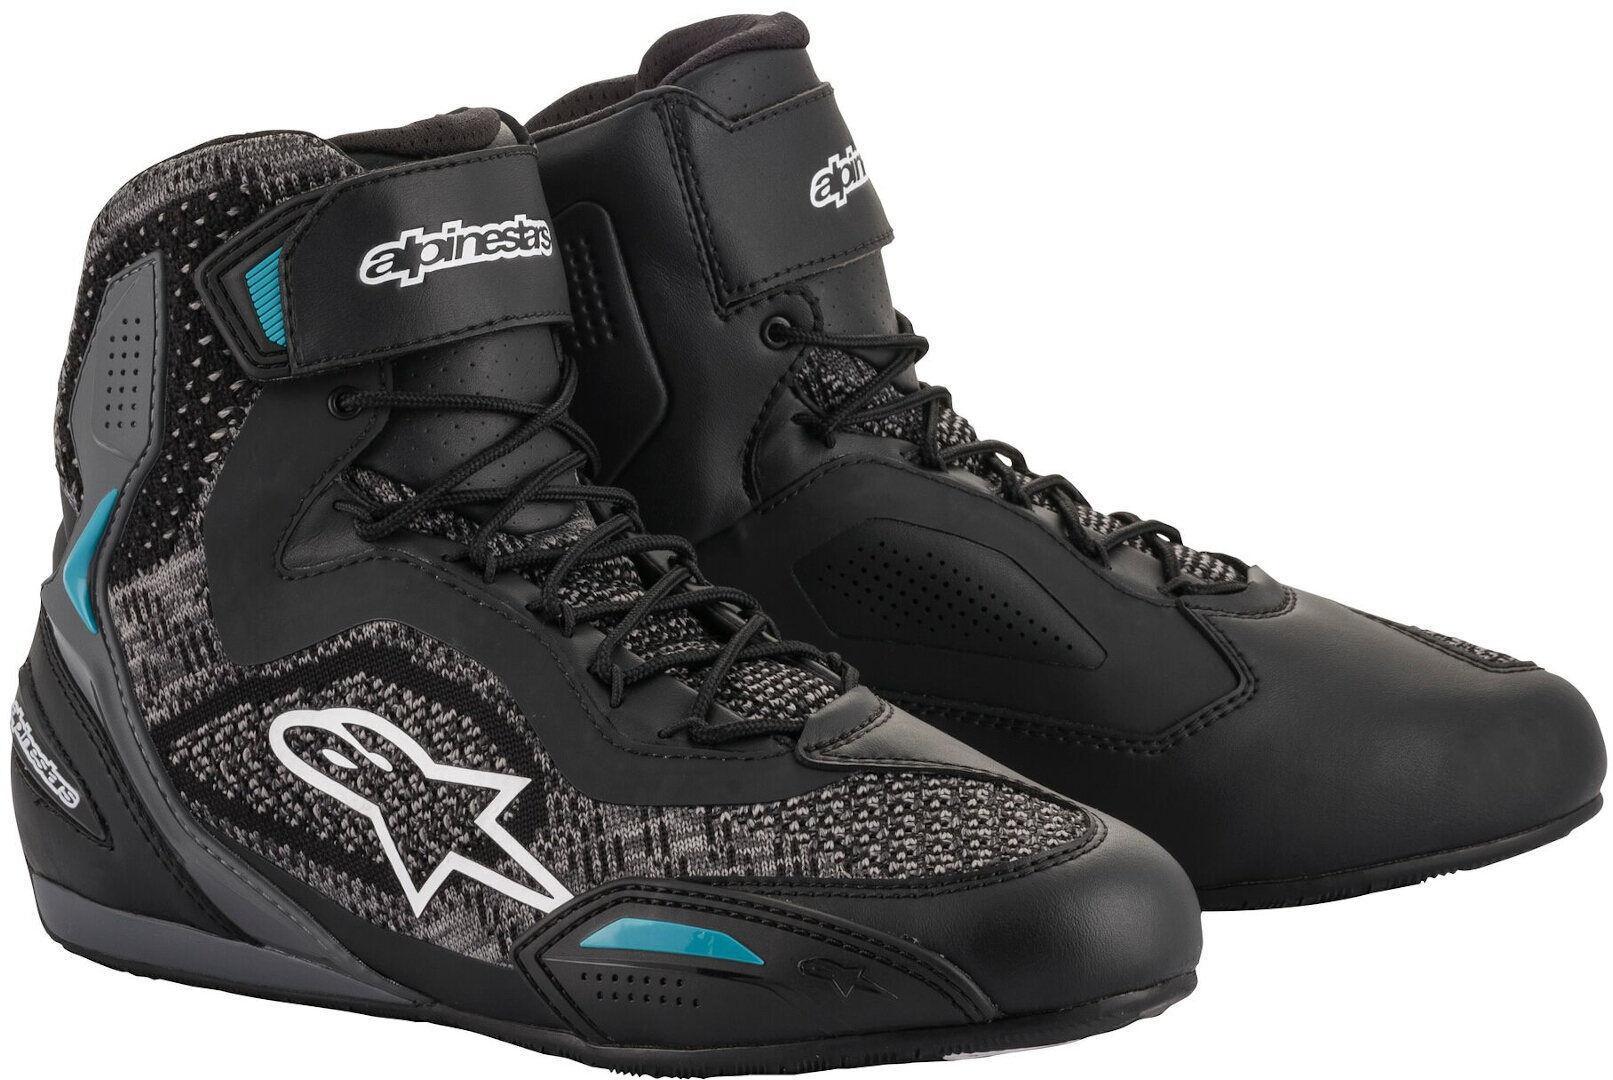 Alpinestars Stella Faster 3 Rideknit Chaussures de moto dames Noir Blanc Bleu taille : 43 44